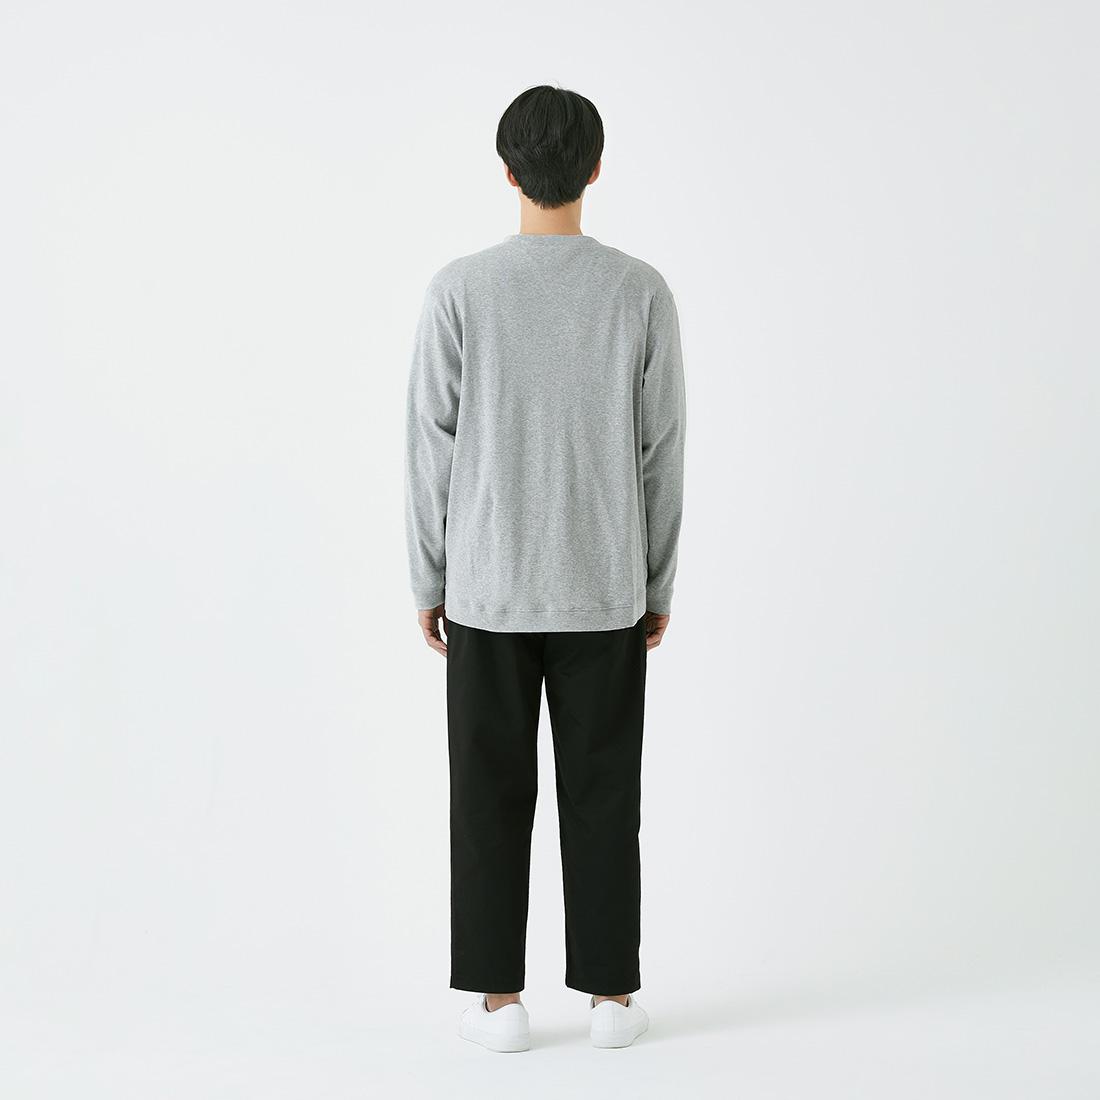 time less drop cardiganの商品写真10